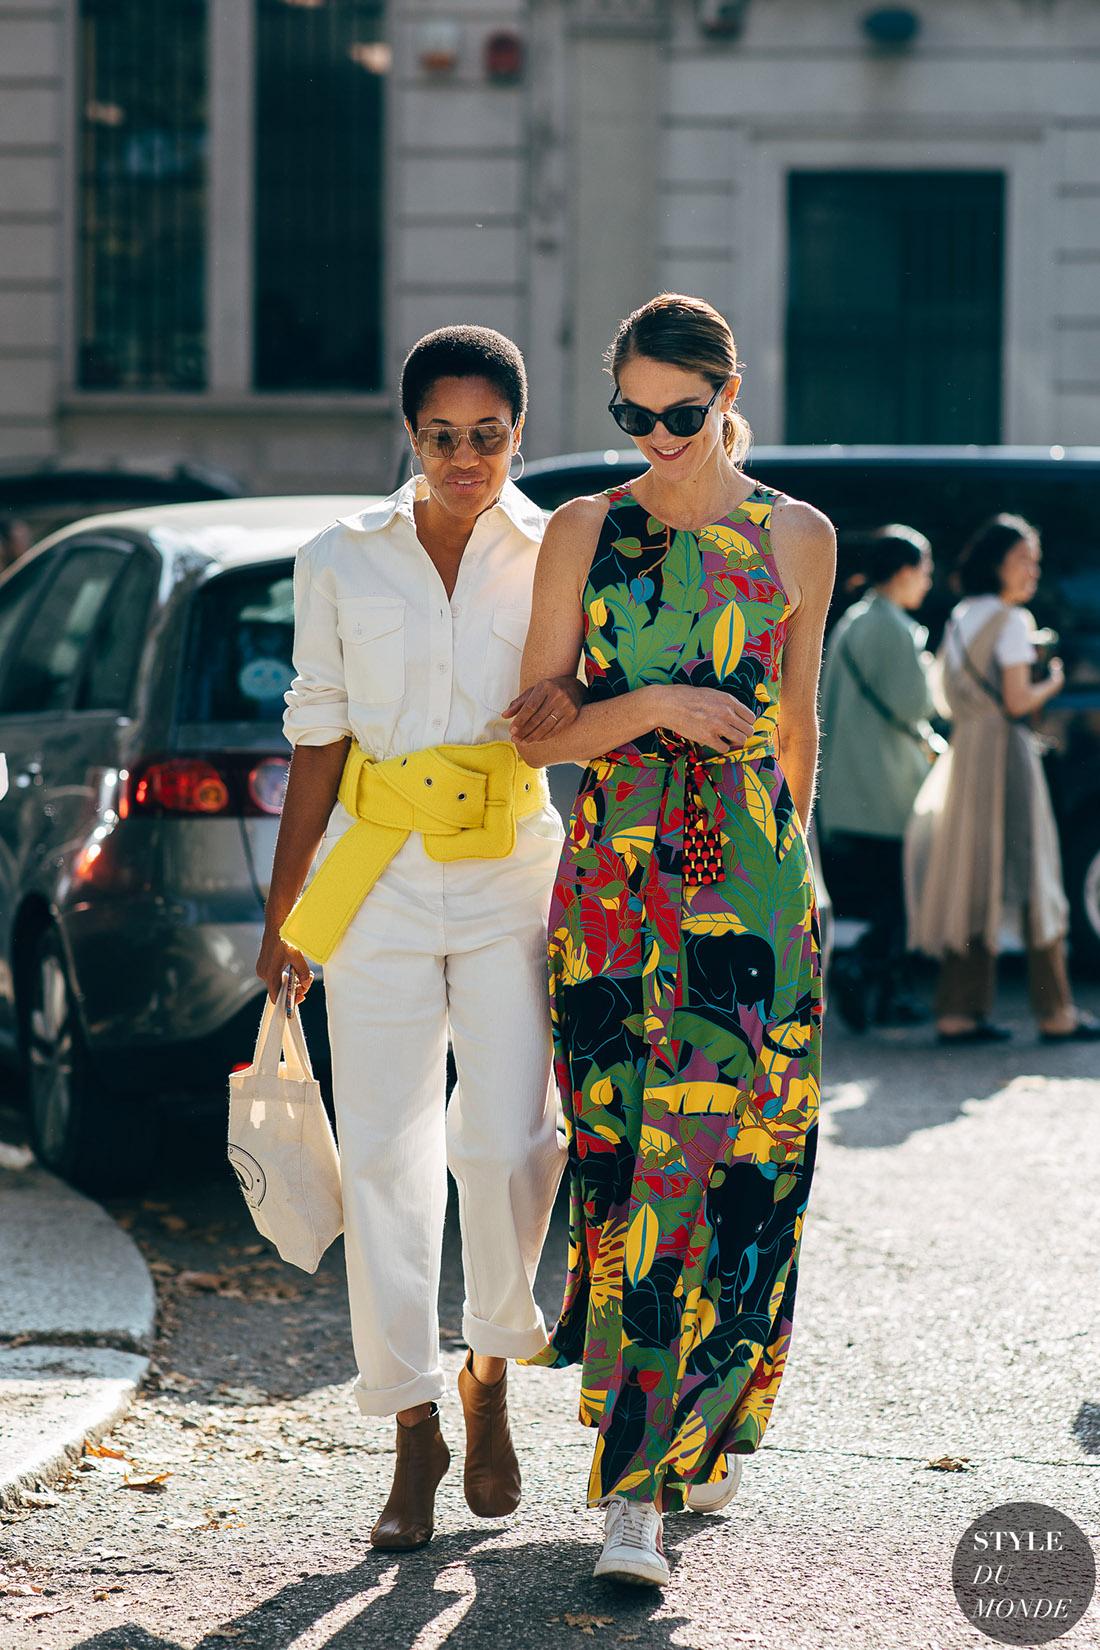 Tamu-McPherson-and-JJ-Martin-by-STYLEDUMONDE-Street-Style-Fashion-Photography20180923_48A3930